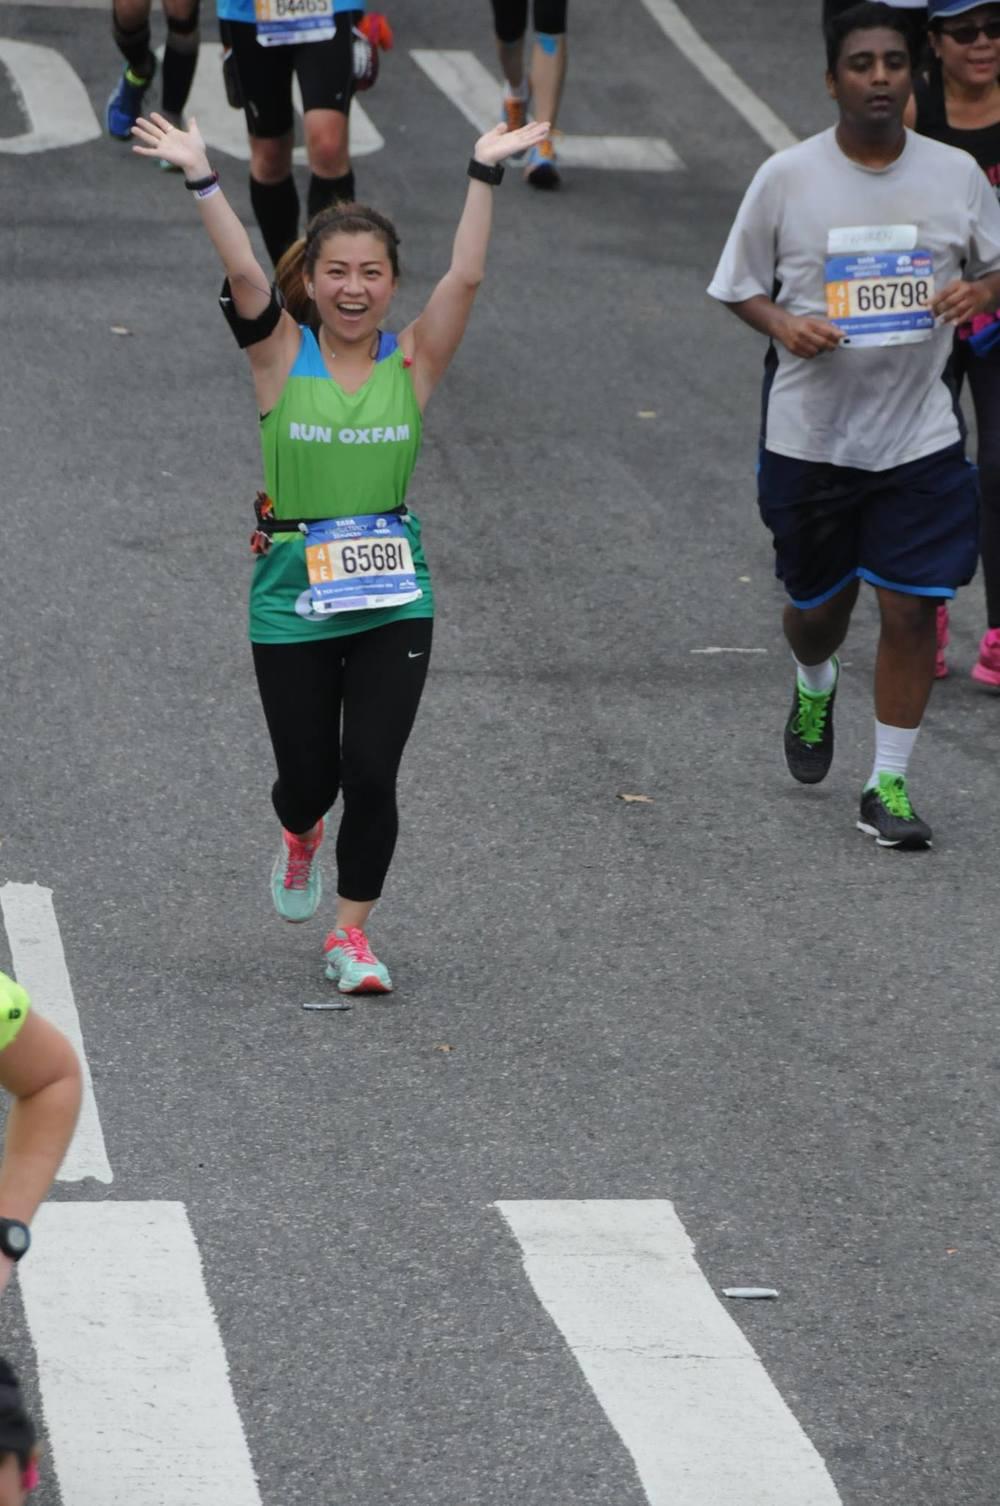 risa xu 2015 nyc marathon run oxfam